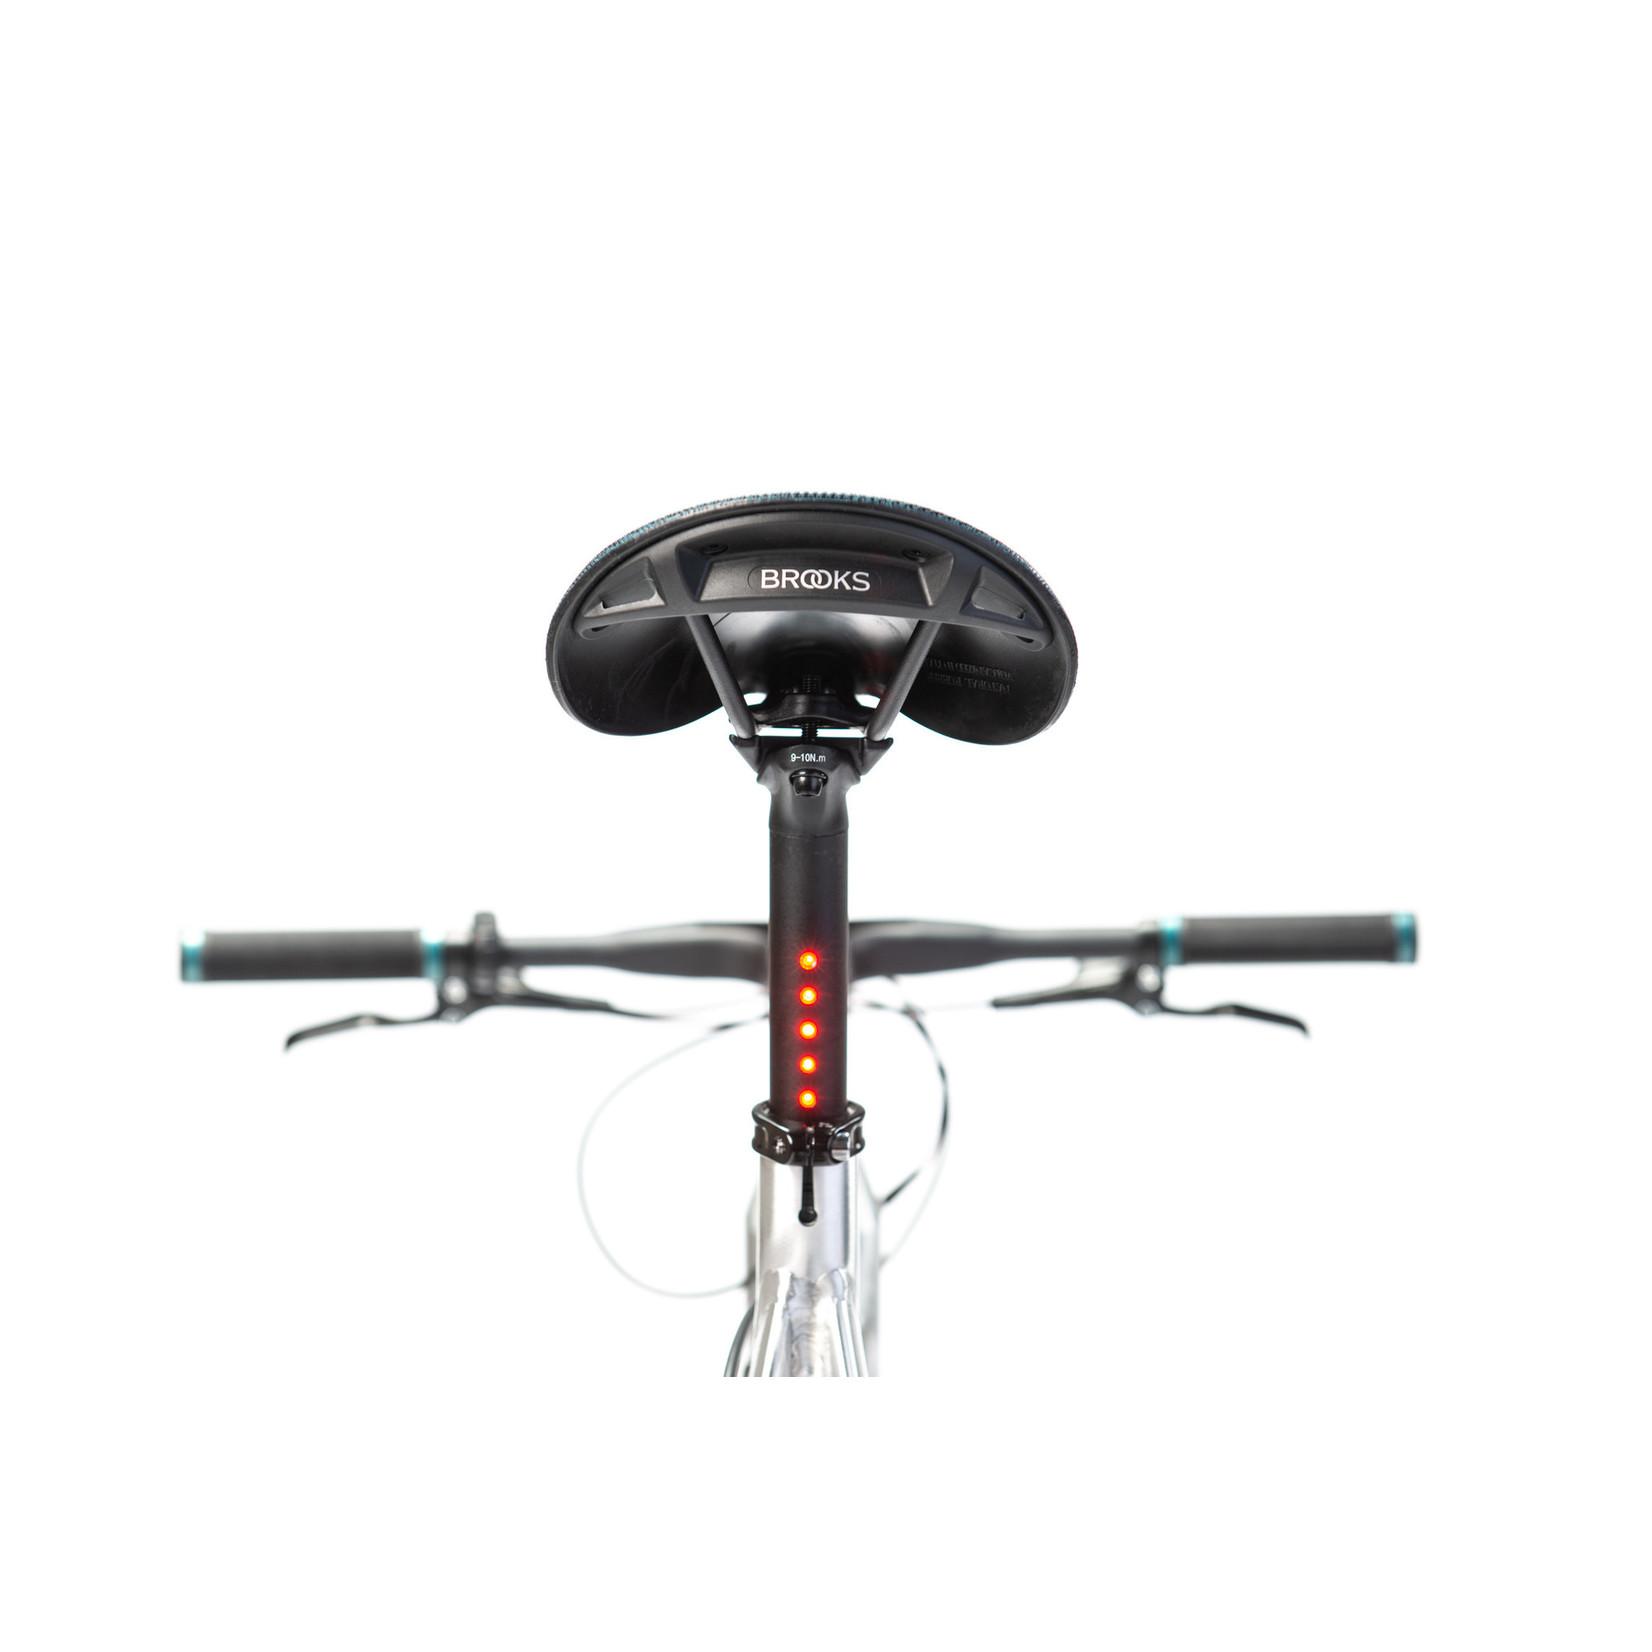 WATT Mobility BROOKLYN (€ 1.230,37) Reservering